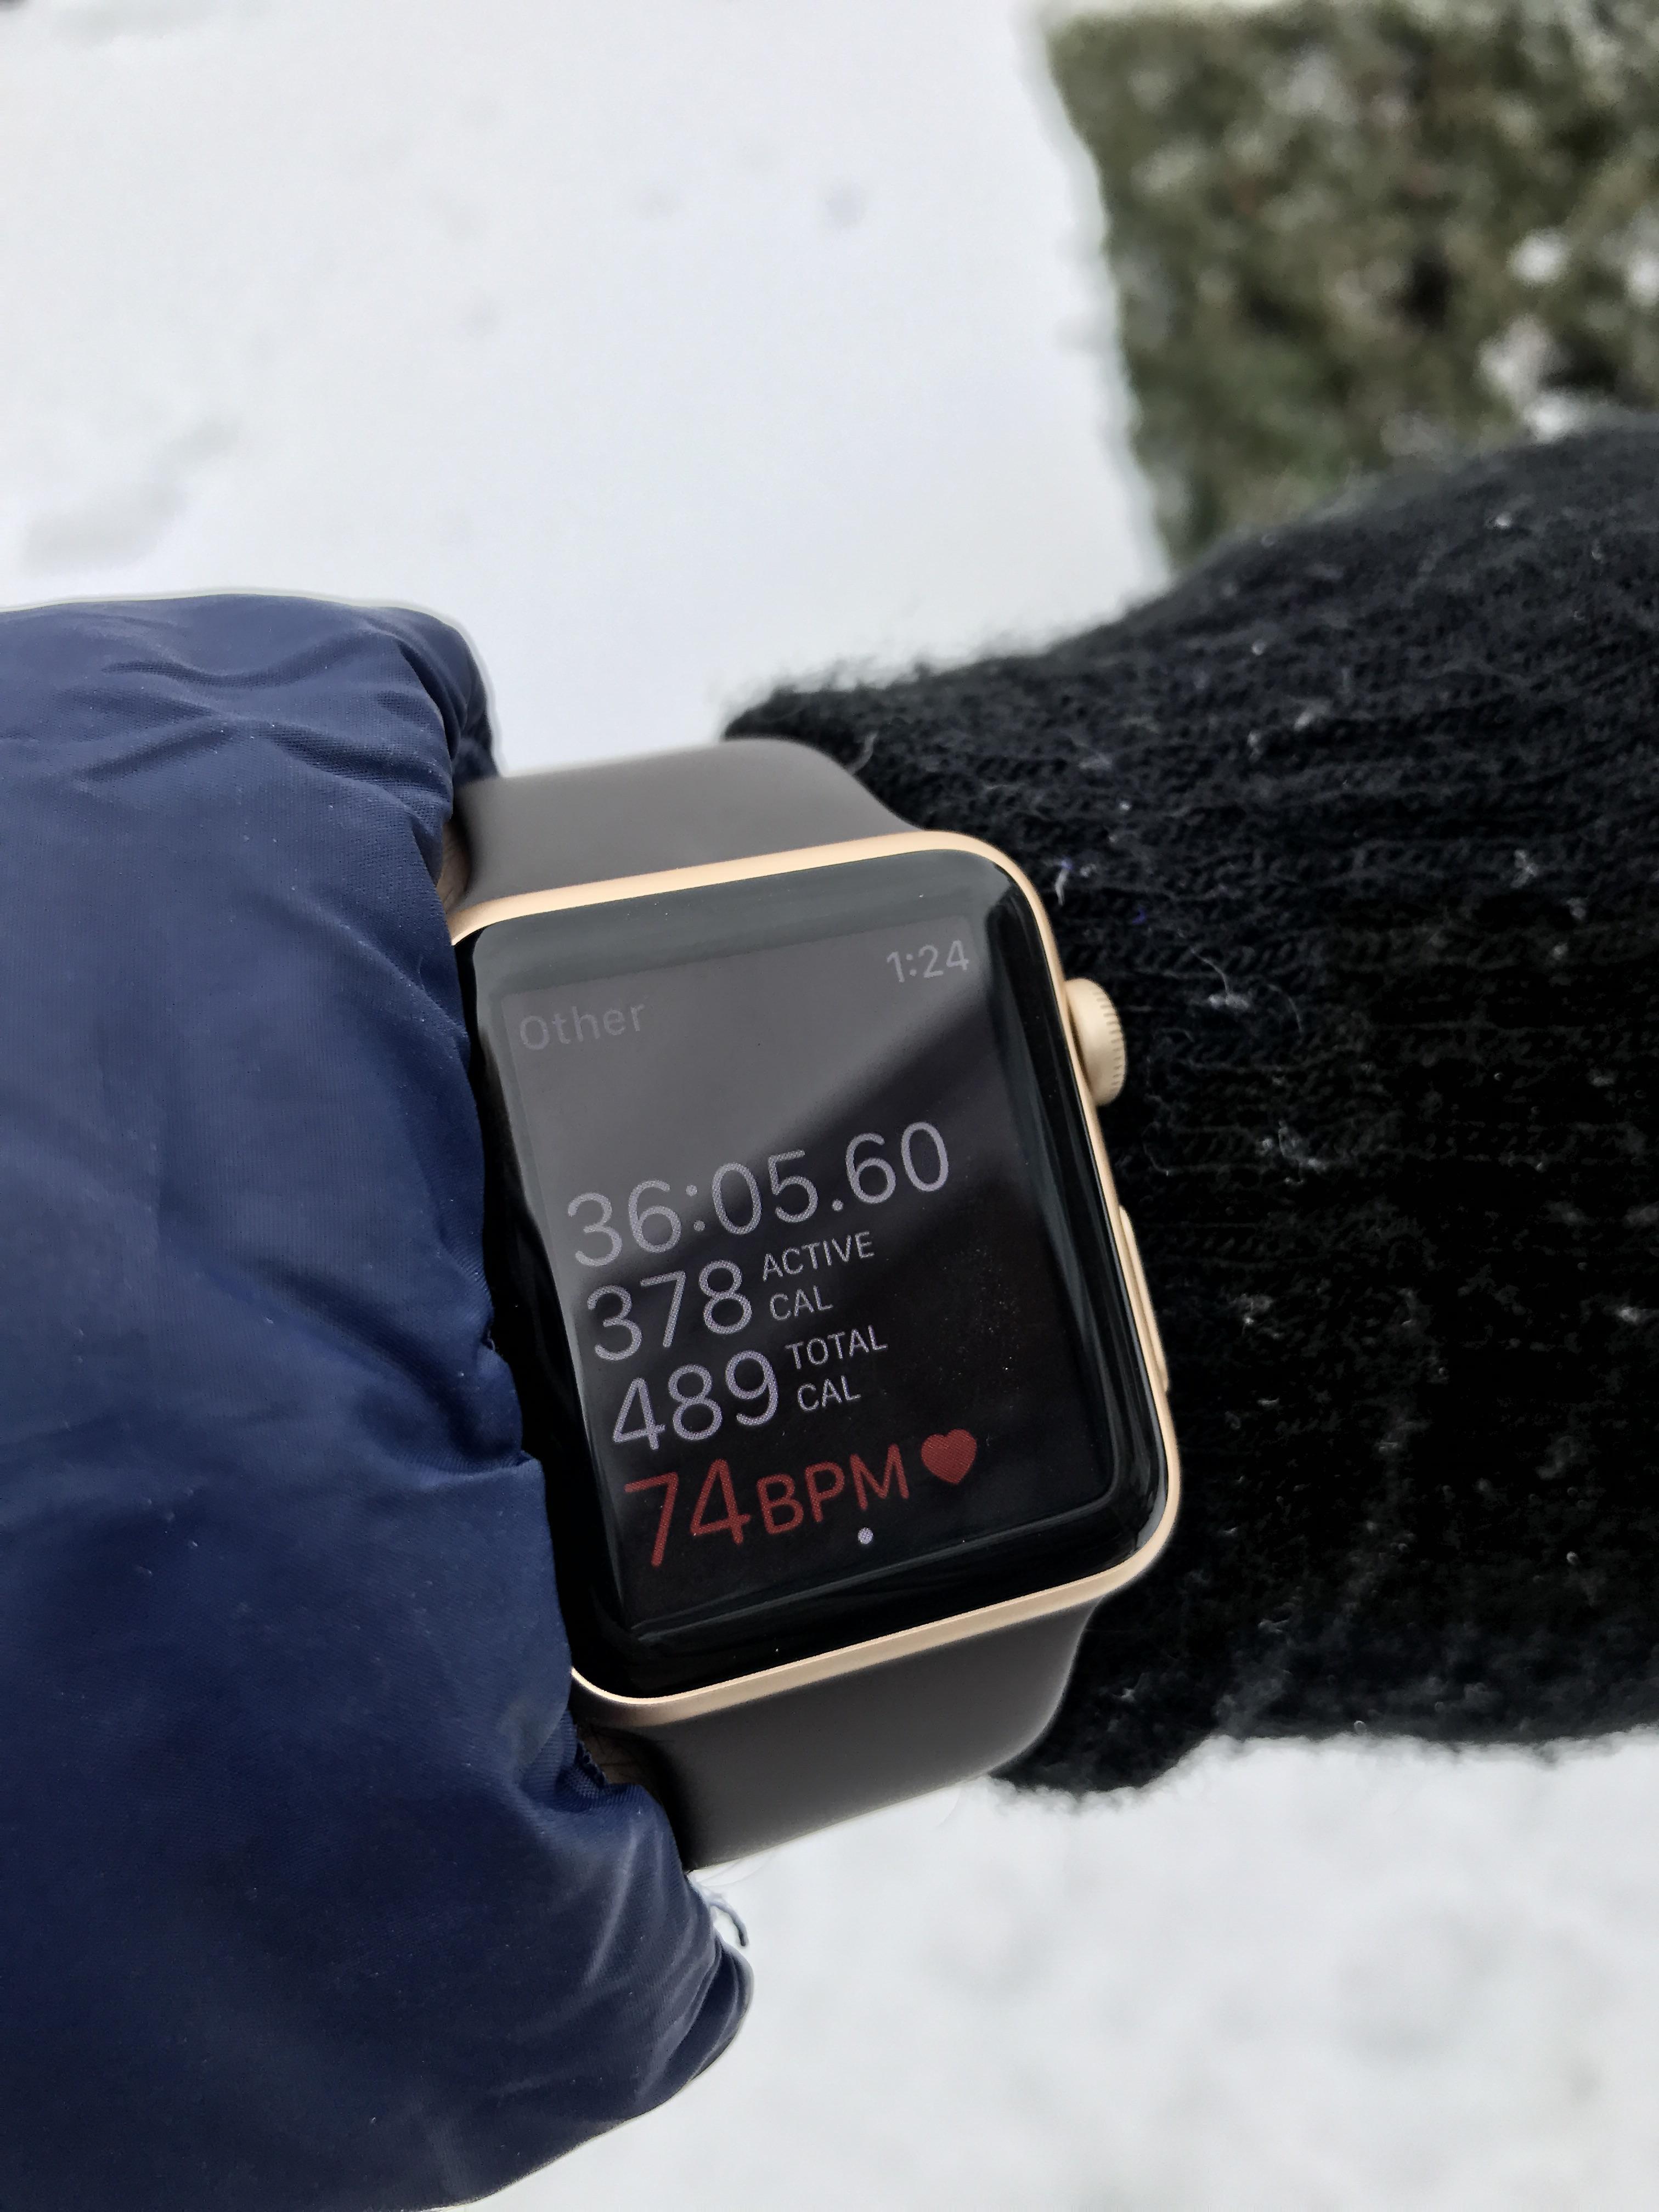 Apple Watch Chest Strap : apple, watch, chest, strap, Gotta, Shoveling, AppleWatch